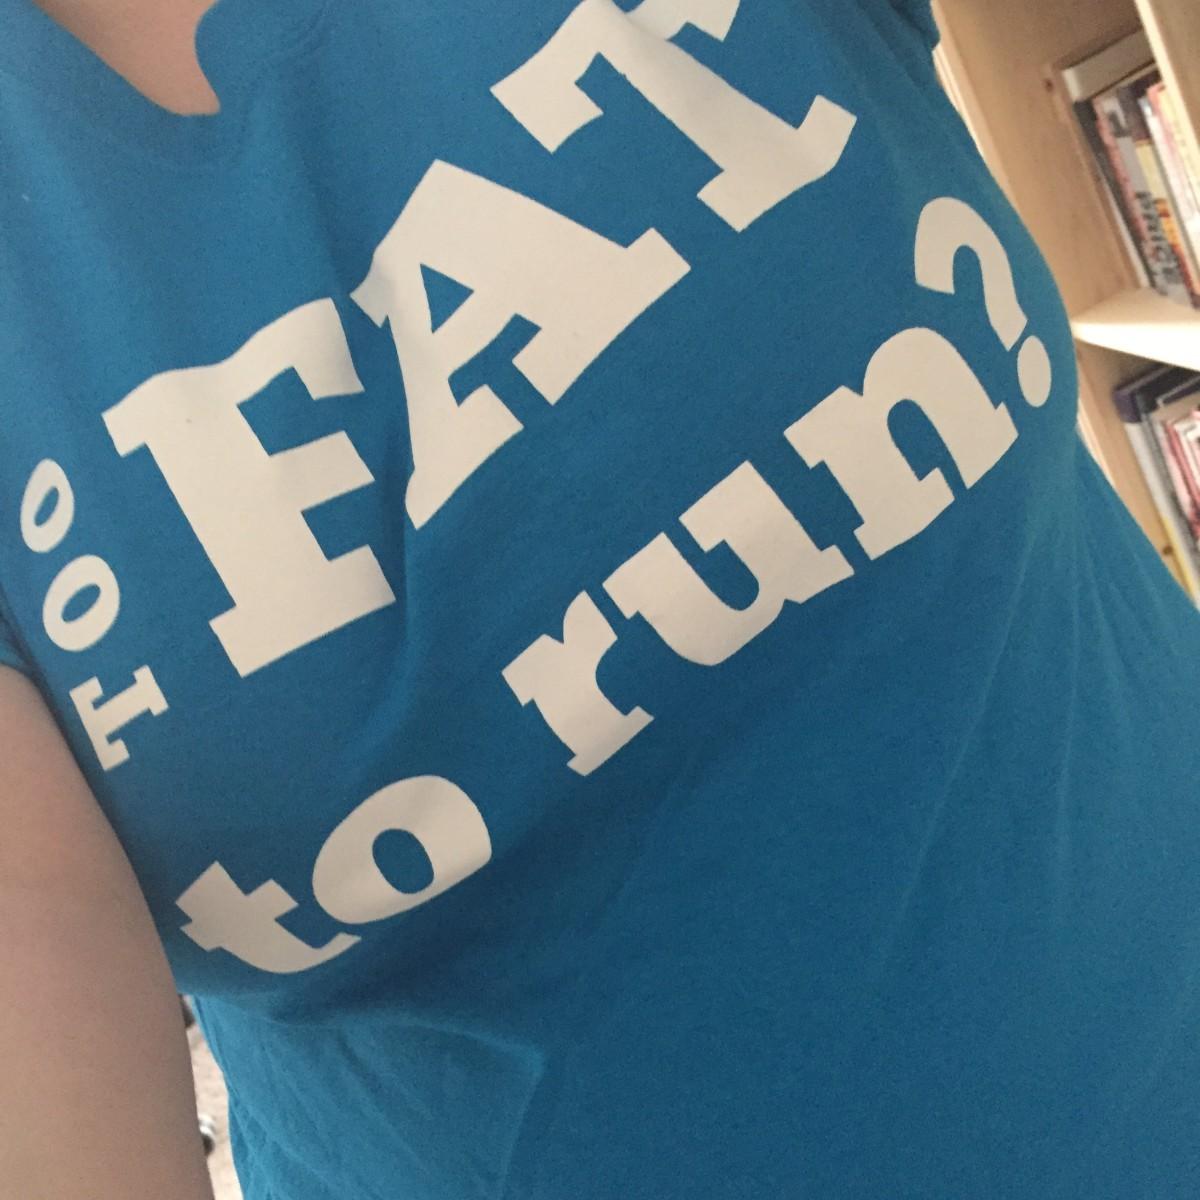 lissie goes running: month one update;